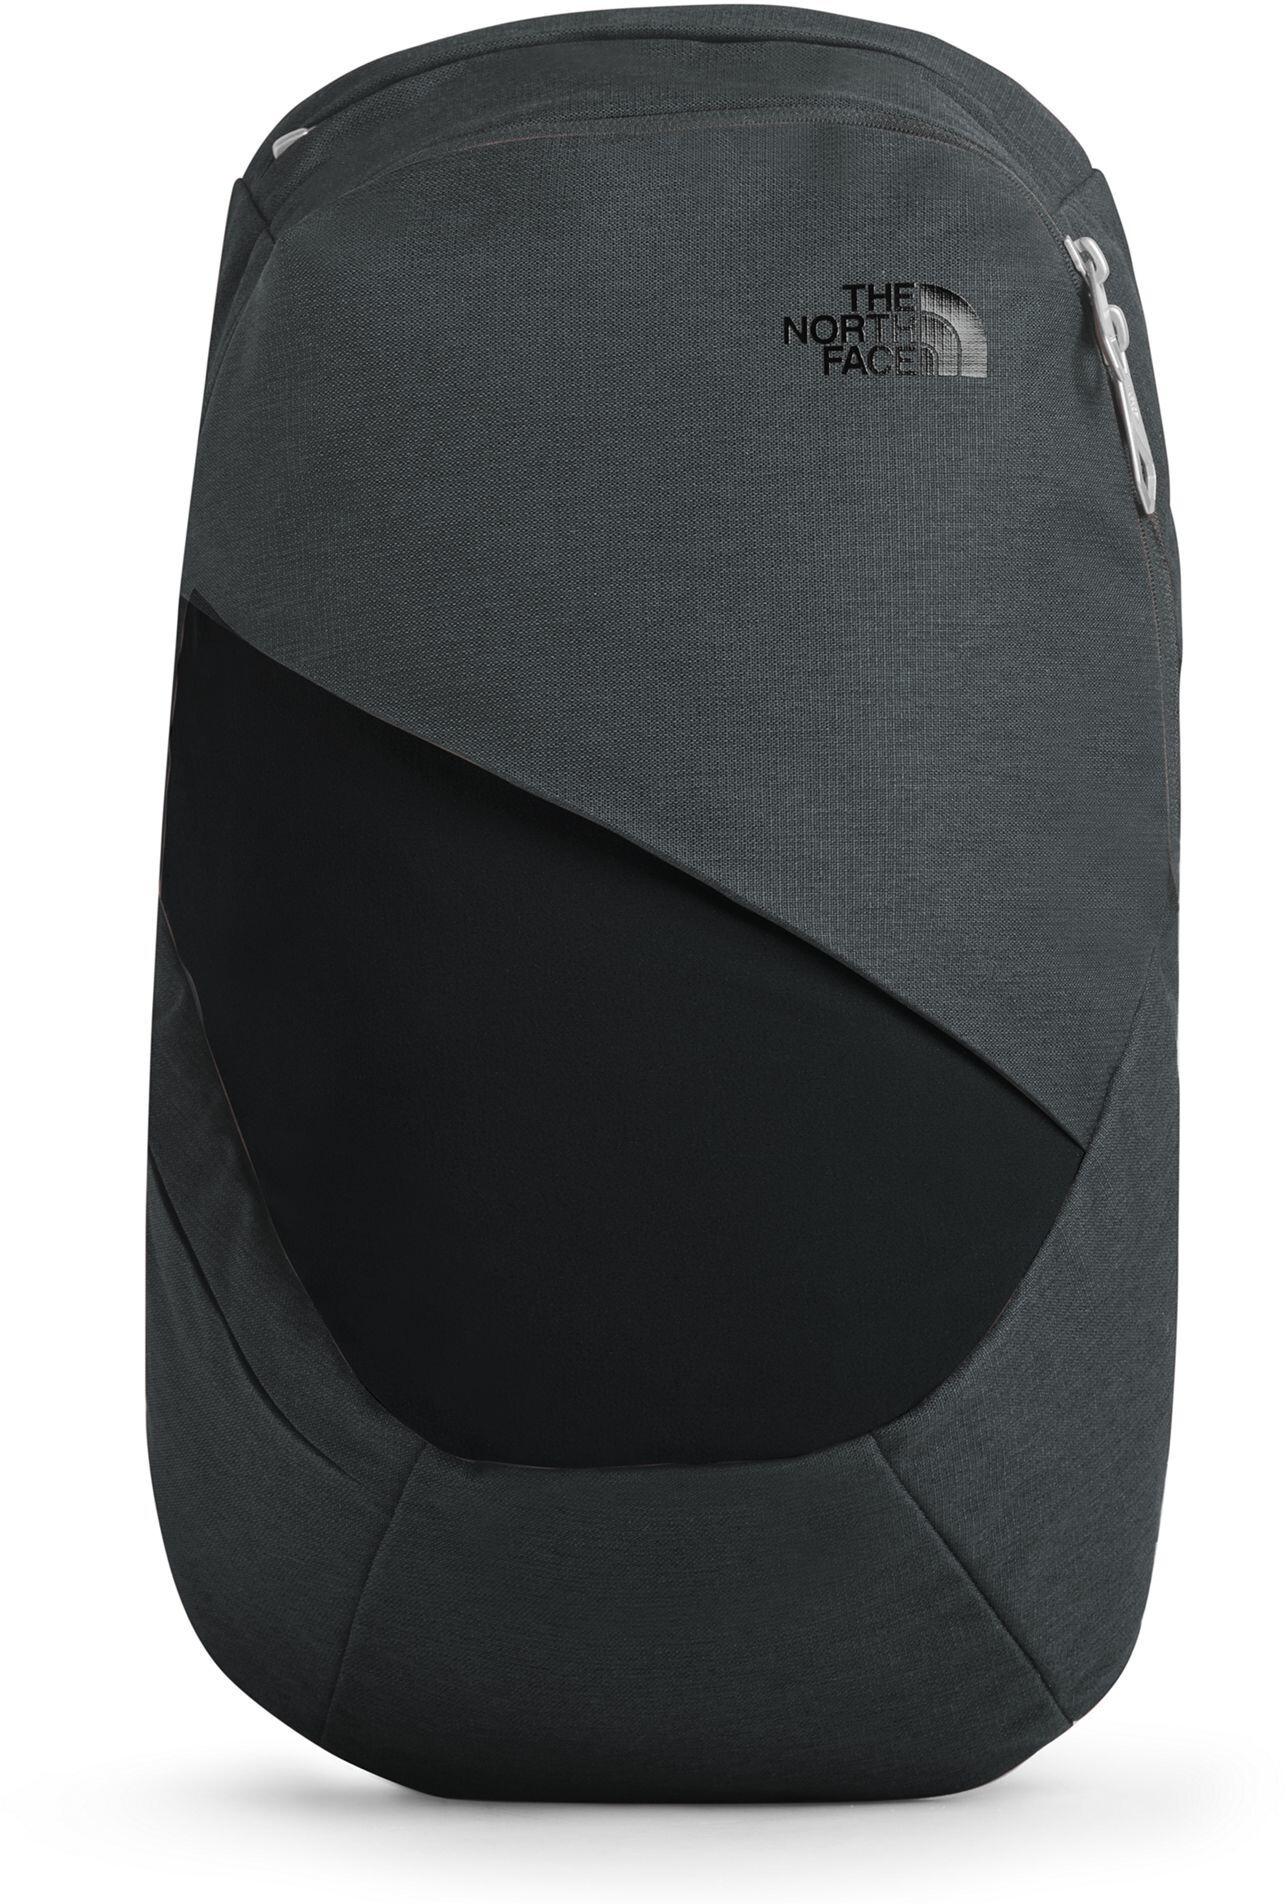 d99f8c48e The North Face Electra Backpack Women asphalt grey light heather/tnf black